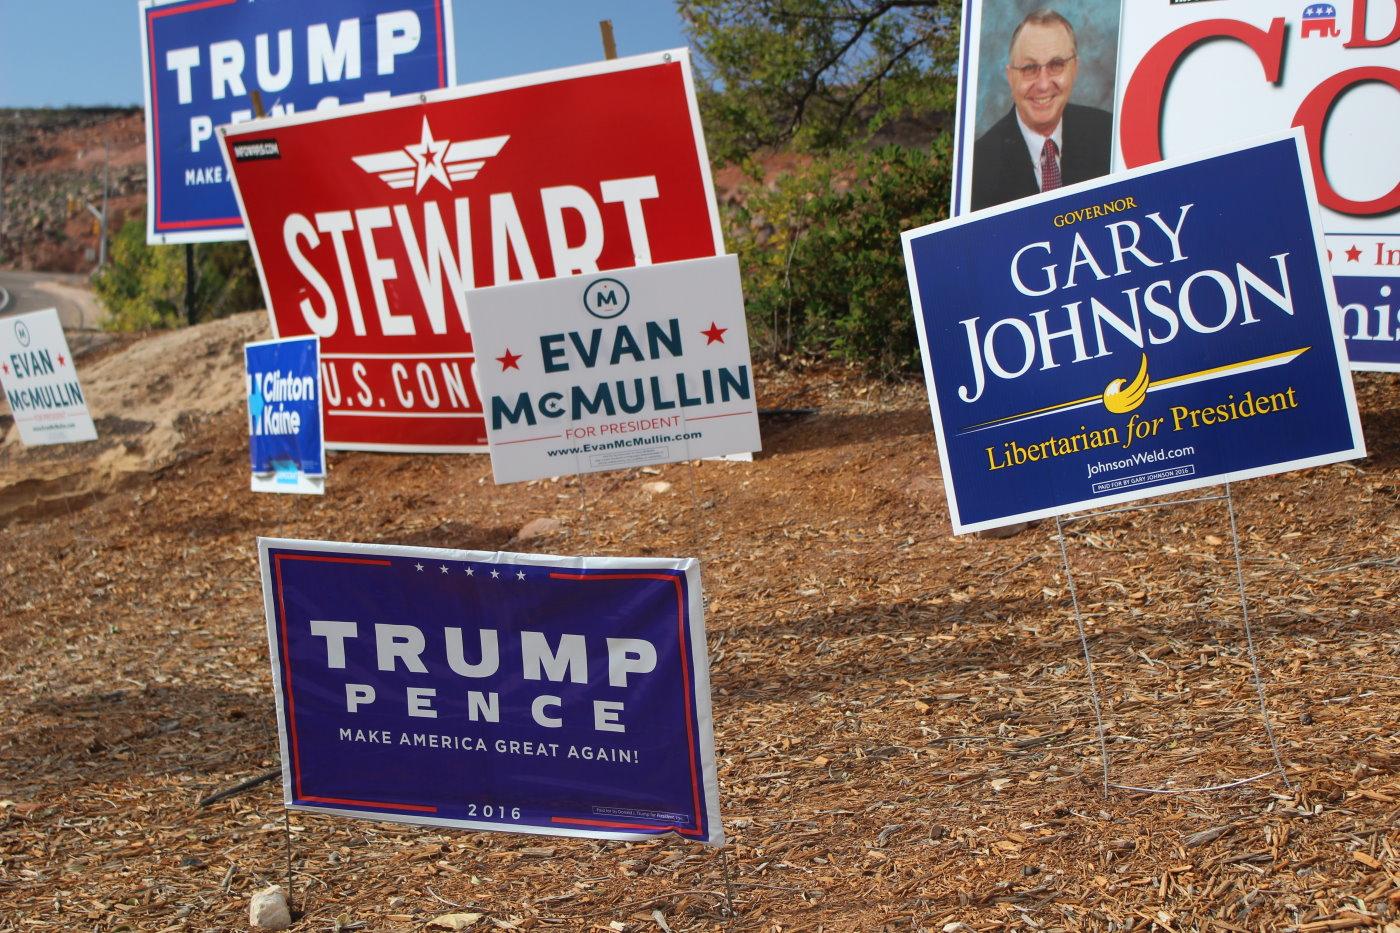 Campaign signs galore at the corner of Bluff Street and Black Ridge Drive, St. George, Utah, Nov. 4, 2016 | Photo by Mori Kessler, St. George News